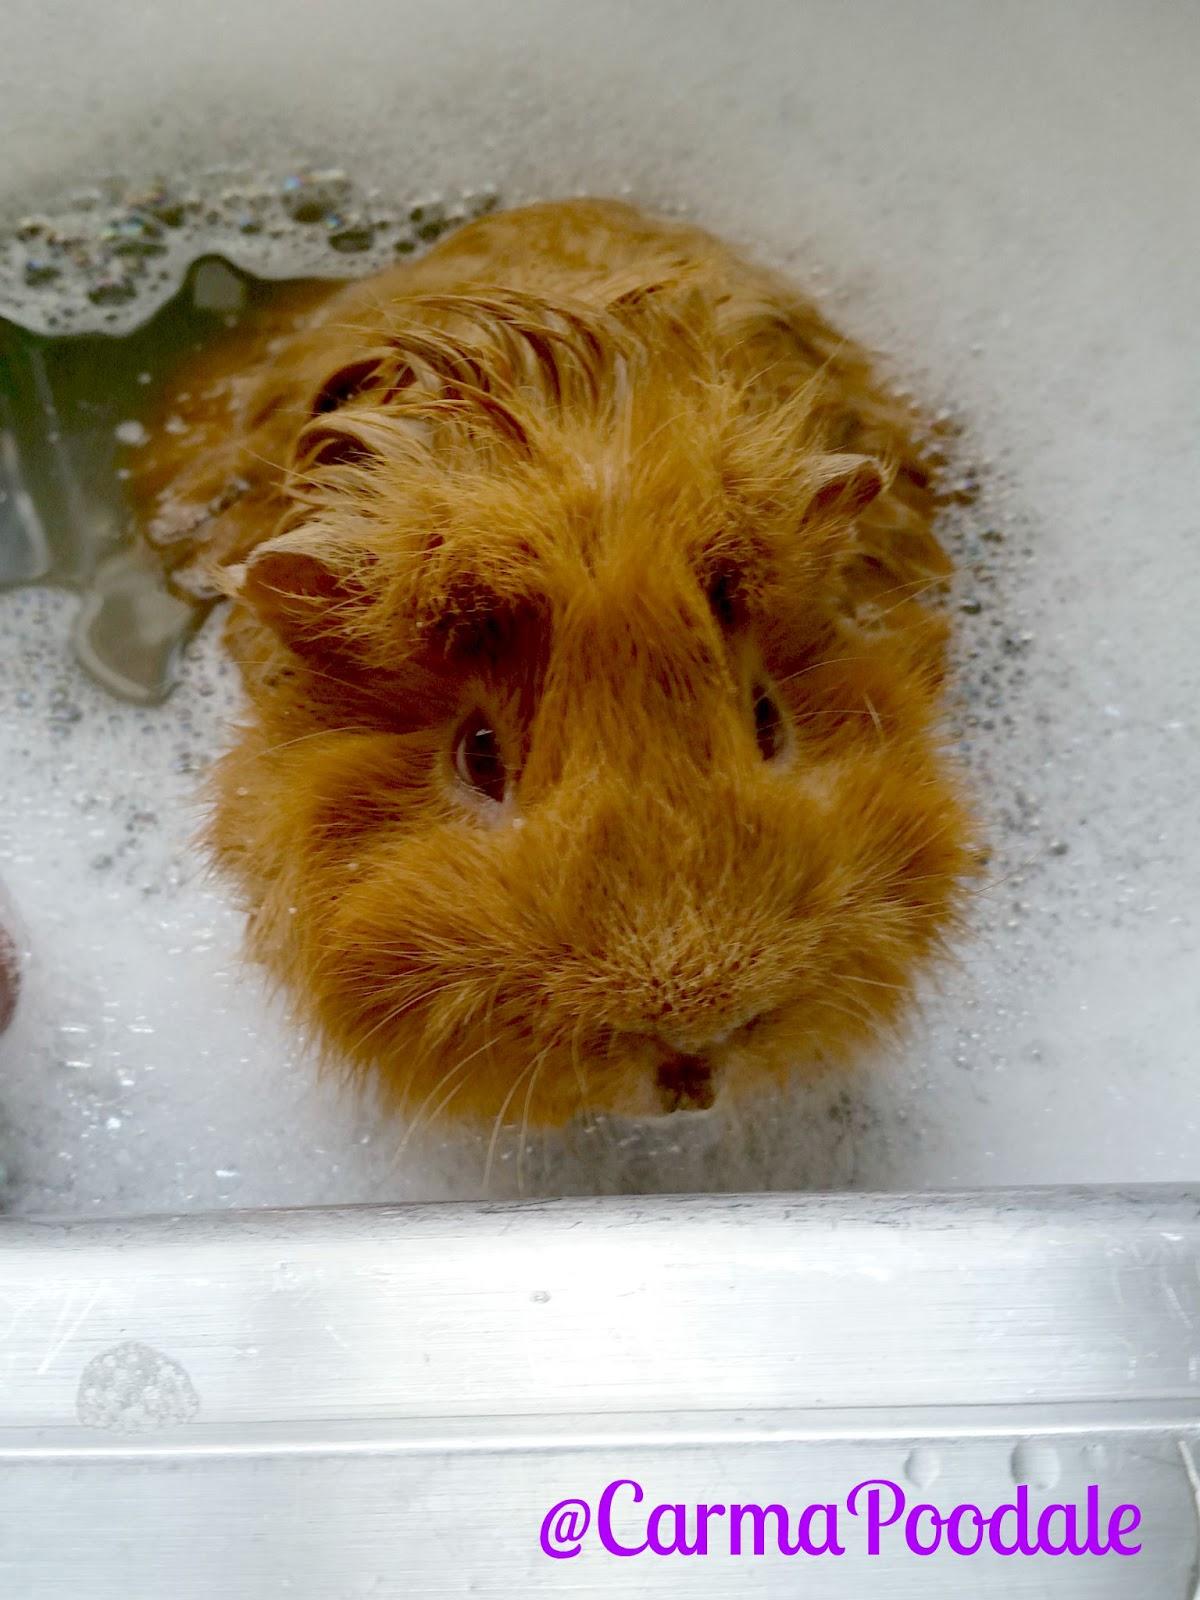 Carma poodale is it guinea pig fun or animal abuse